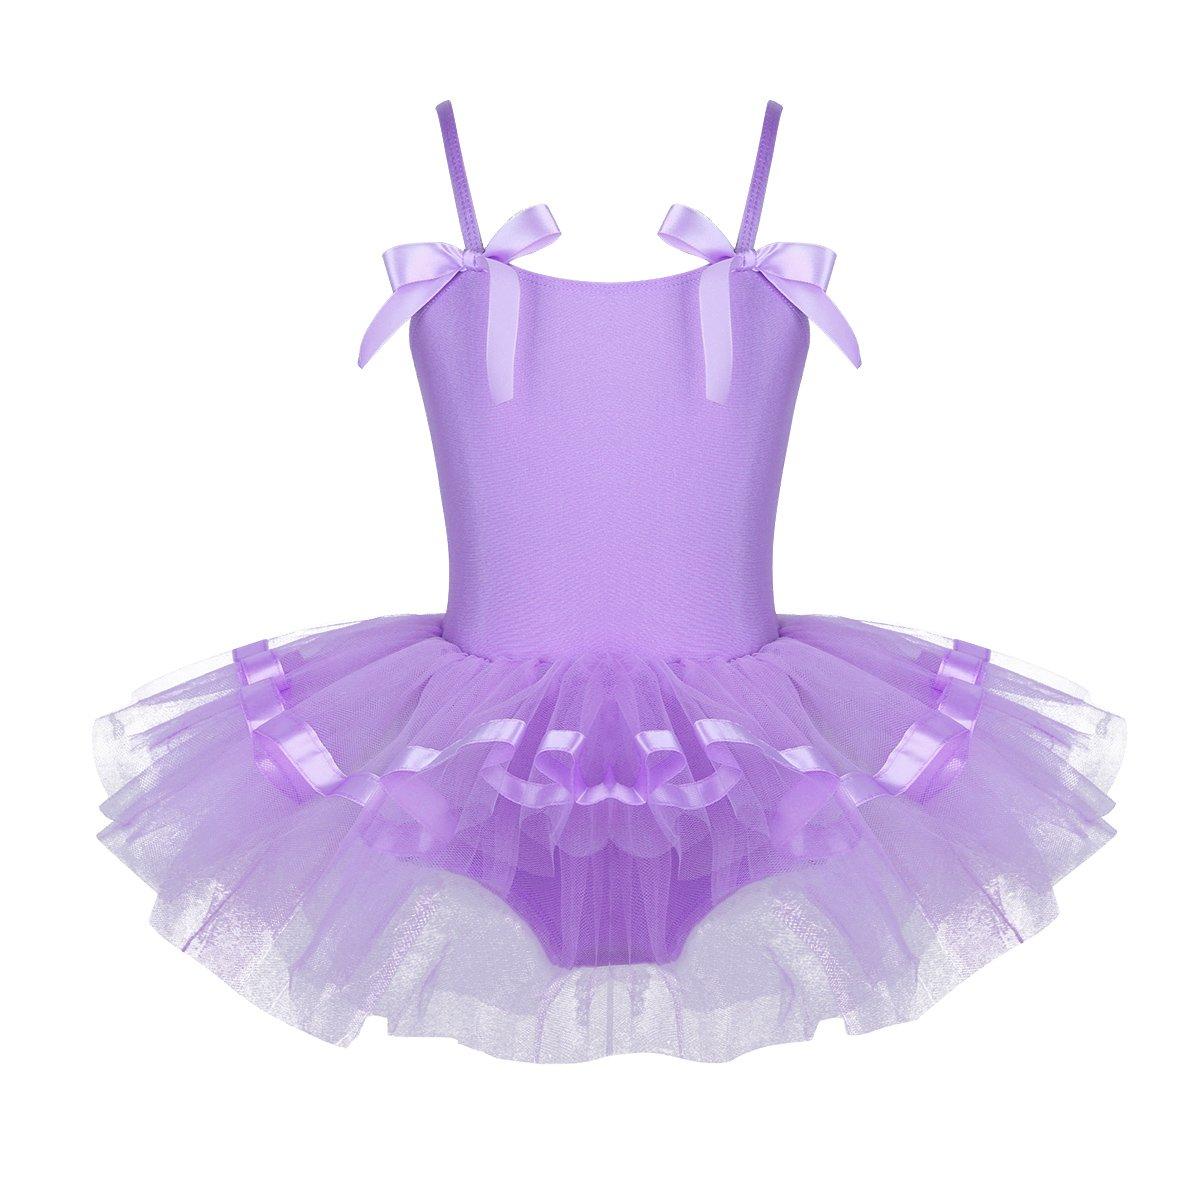 iiniim DRESS ガールズ B07FYC8VFH Camisole Purple 43528